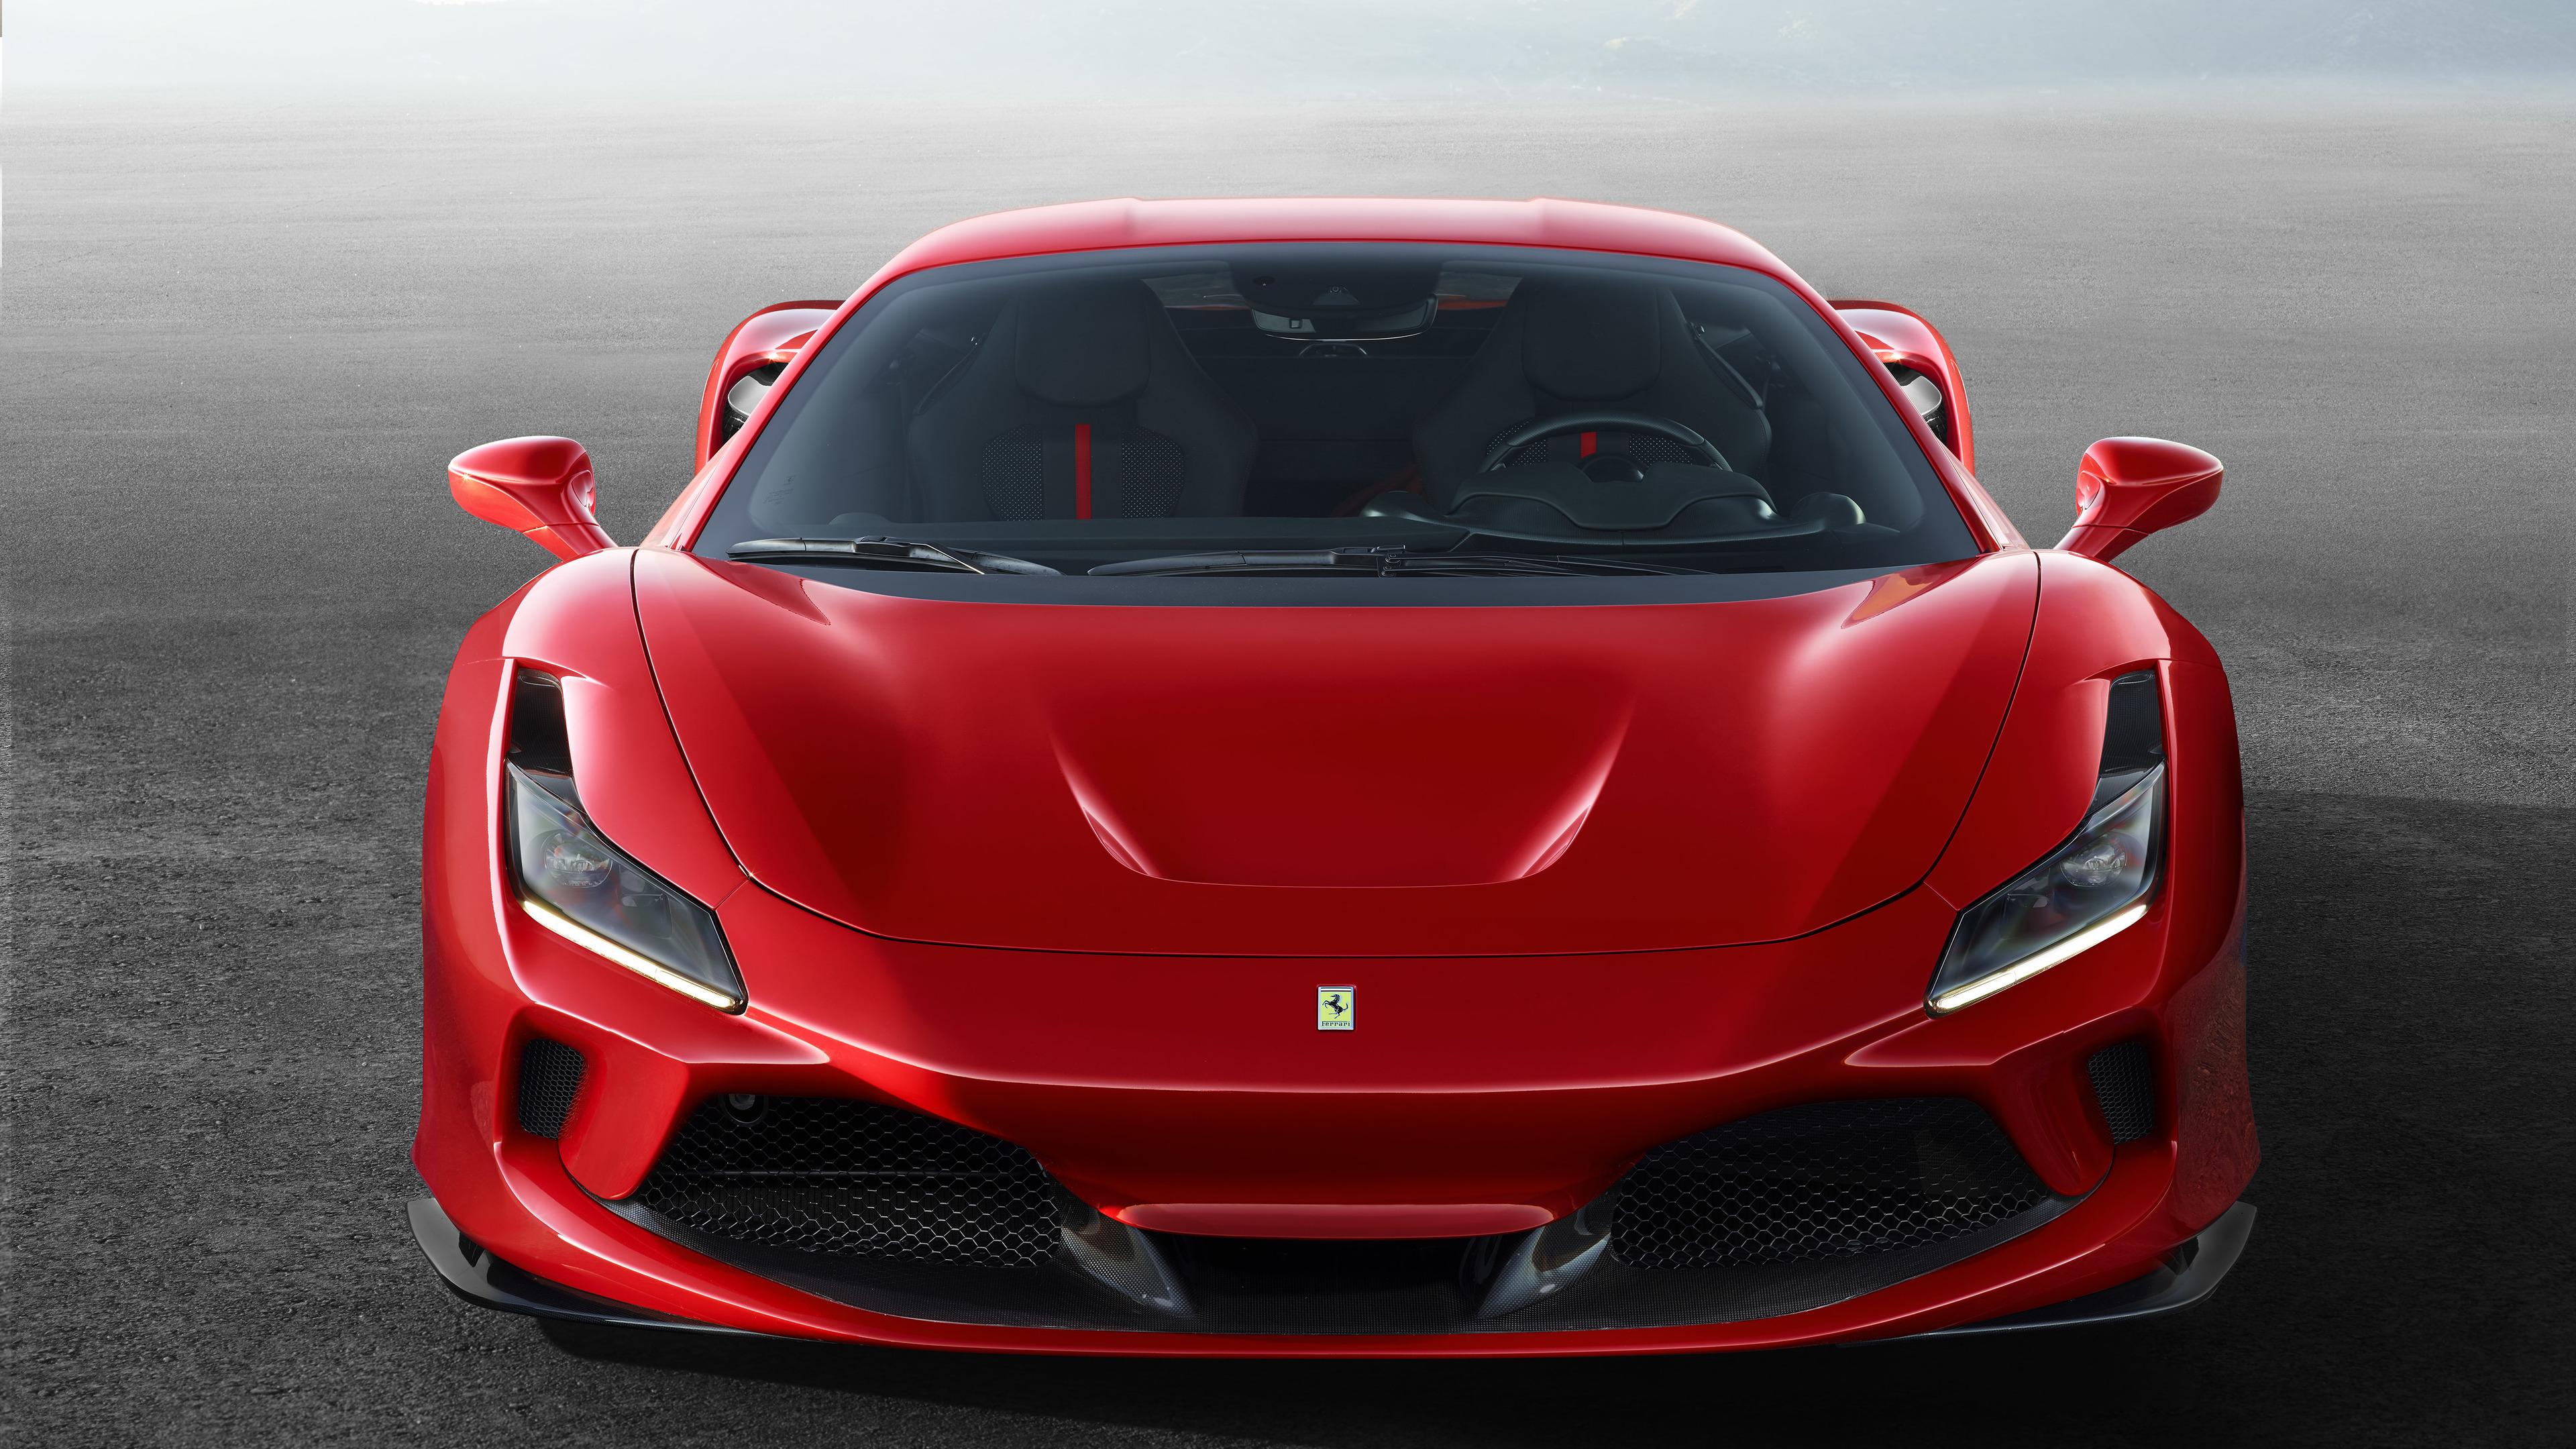 2019 ferrari f8 tribute front 4k 1553075830 - 2019 Ferrari F8 Tribute Front 4k - hd-wallpapers, ferrari wallpapers, cars wallpapers, 4k-wallpapers, 2019 cars wallpapers